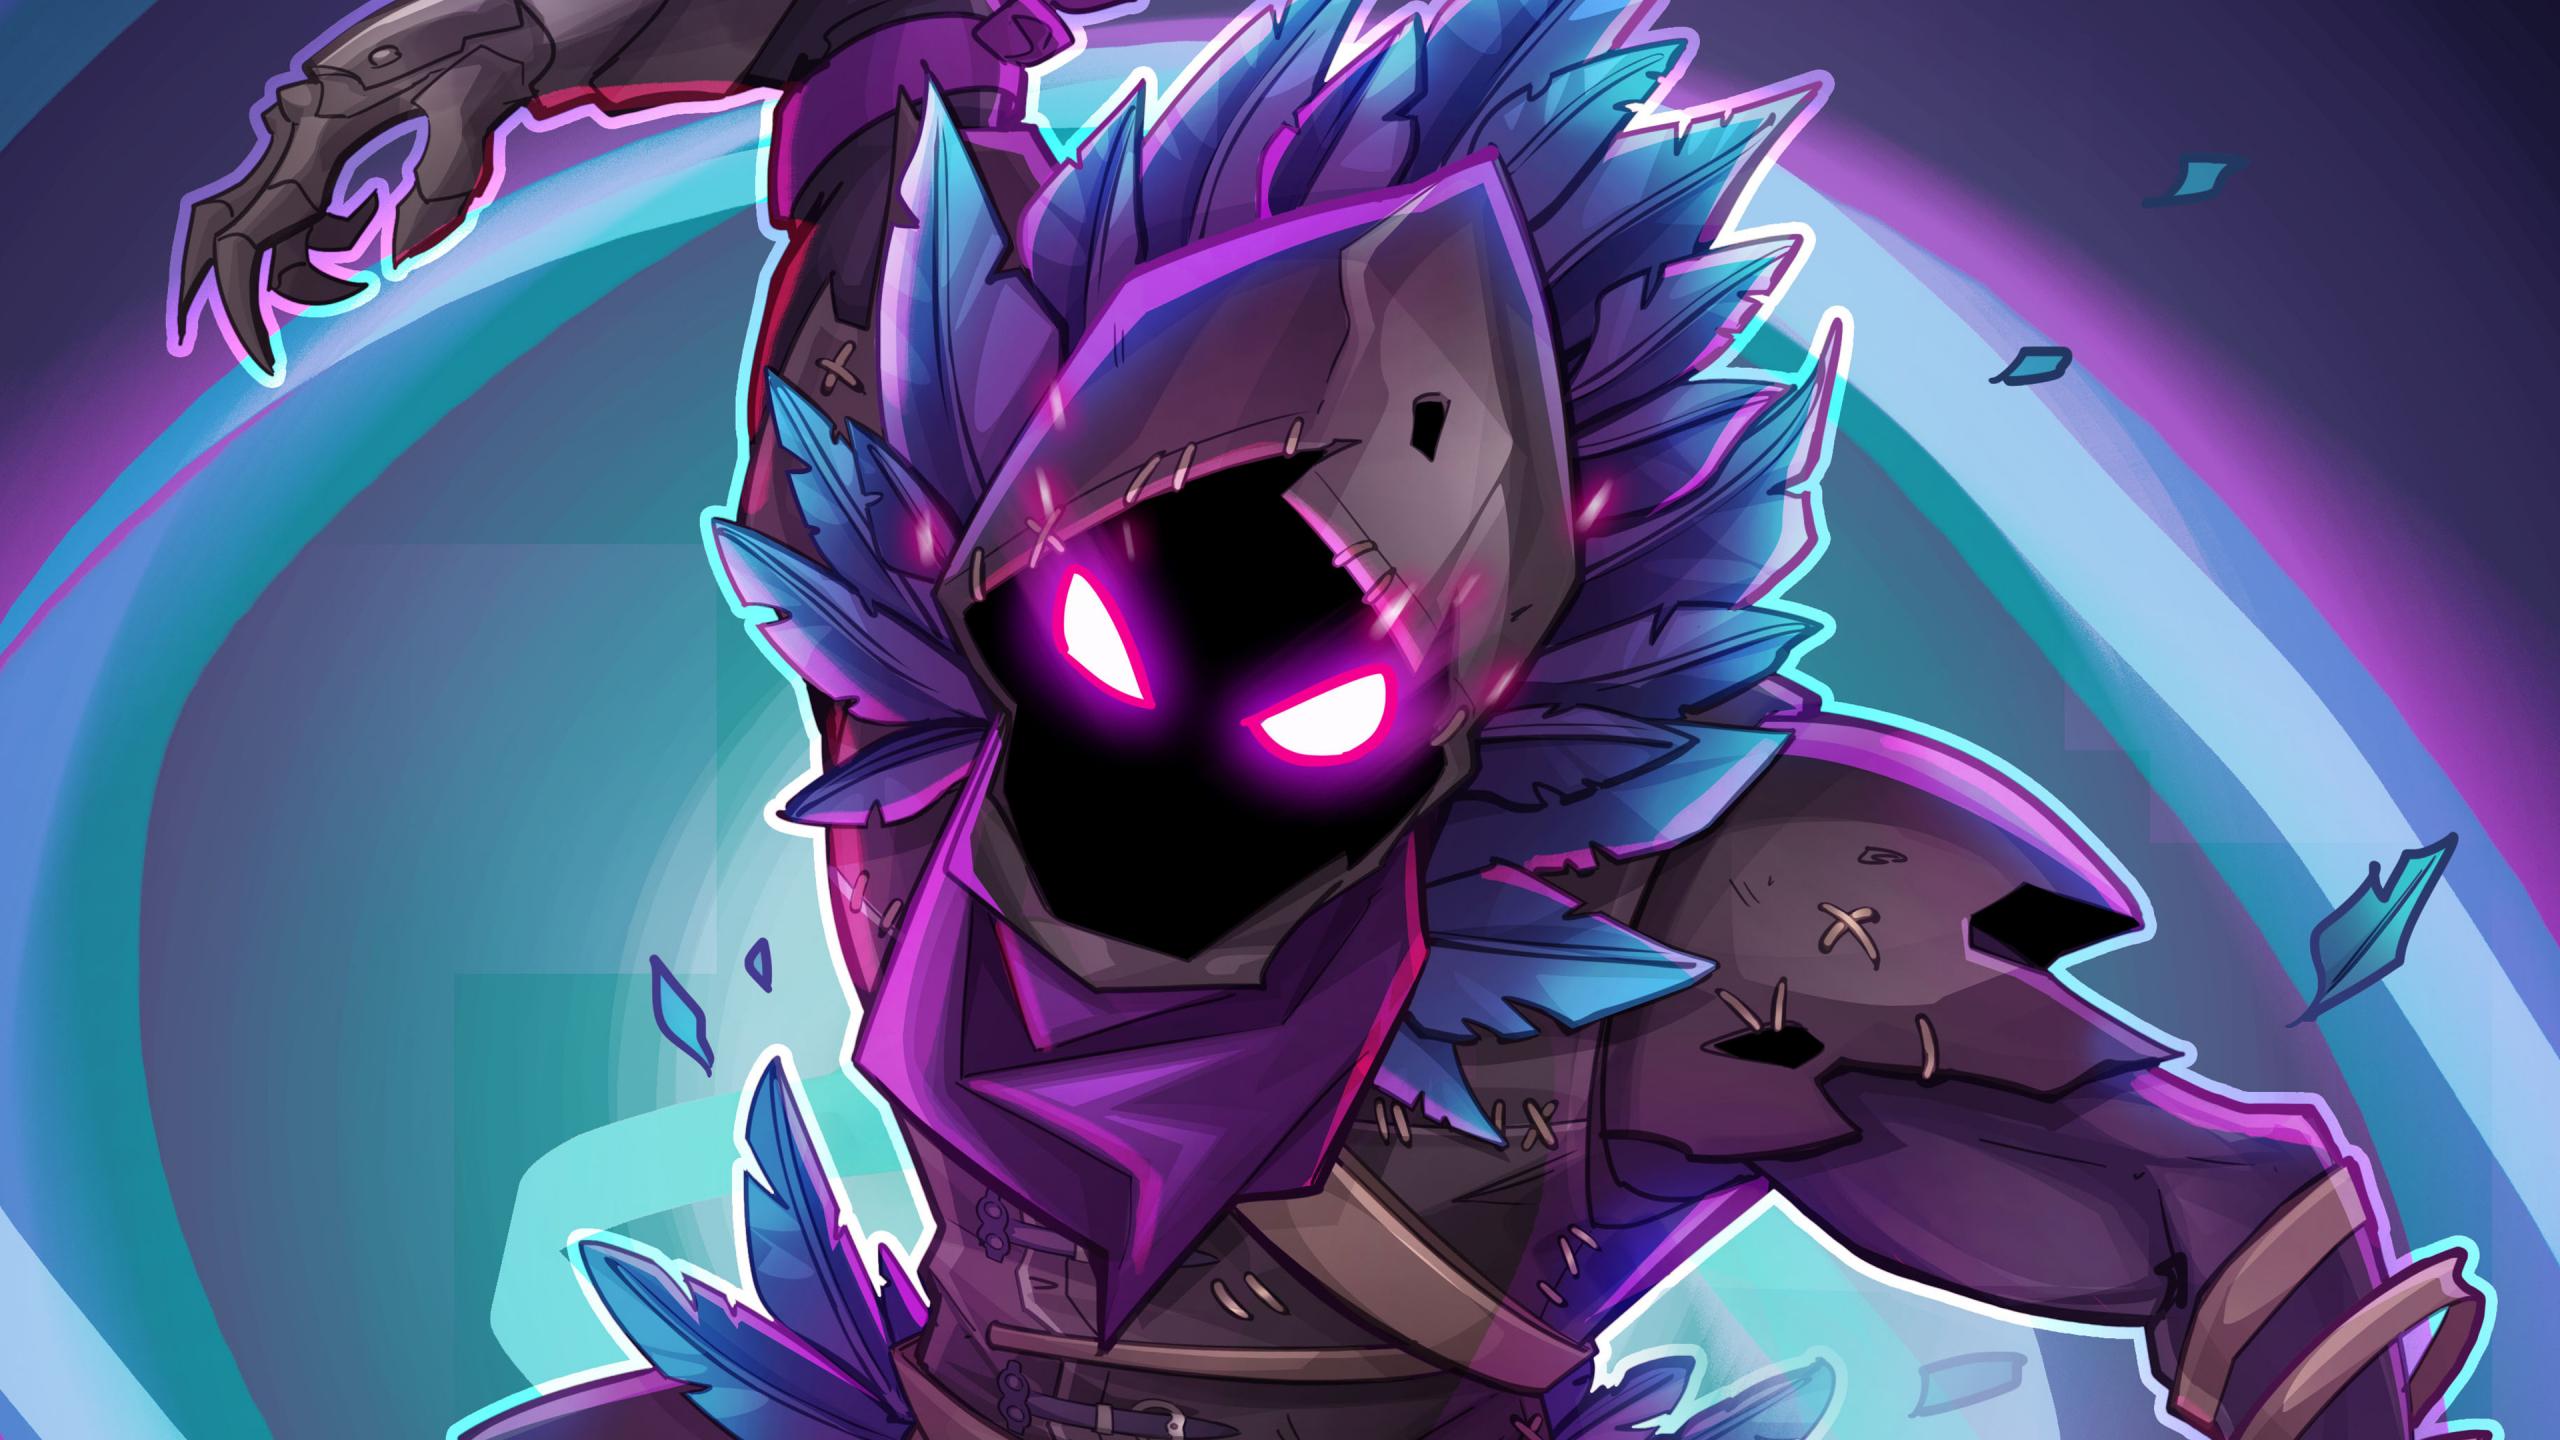 Cute Hd Wallpapers 1080p Widescreen Download 2560x1440 Wallpaper Raven Fortnite Battle Royale